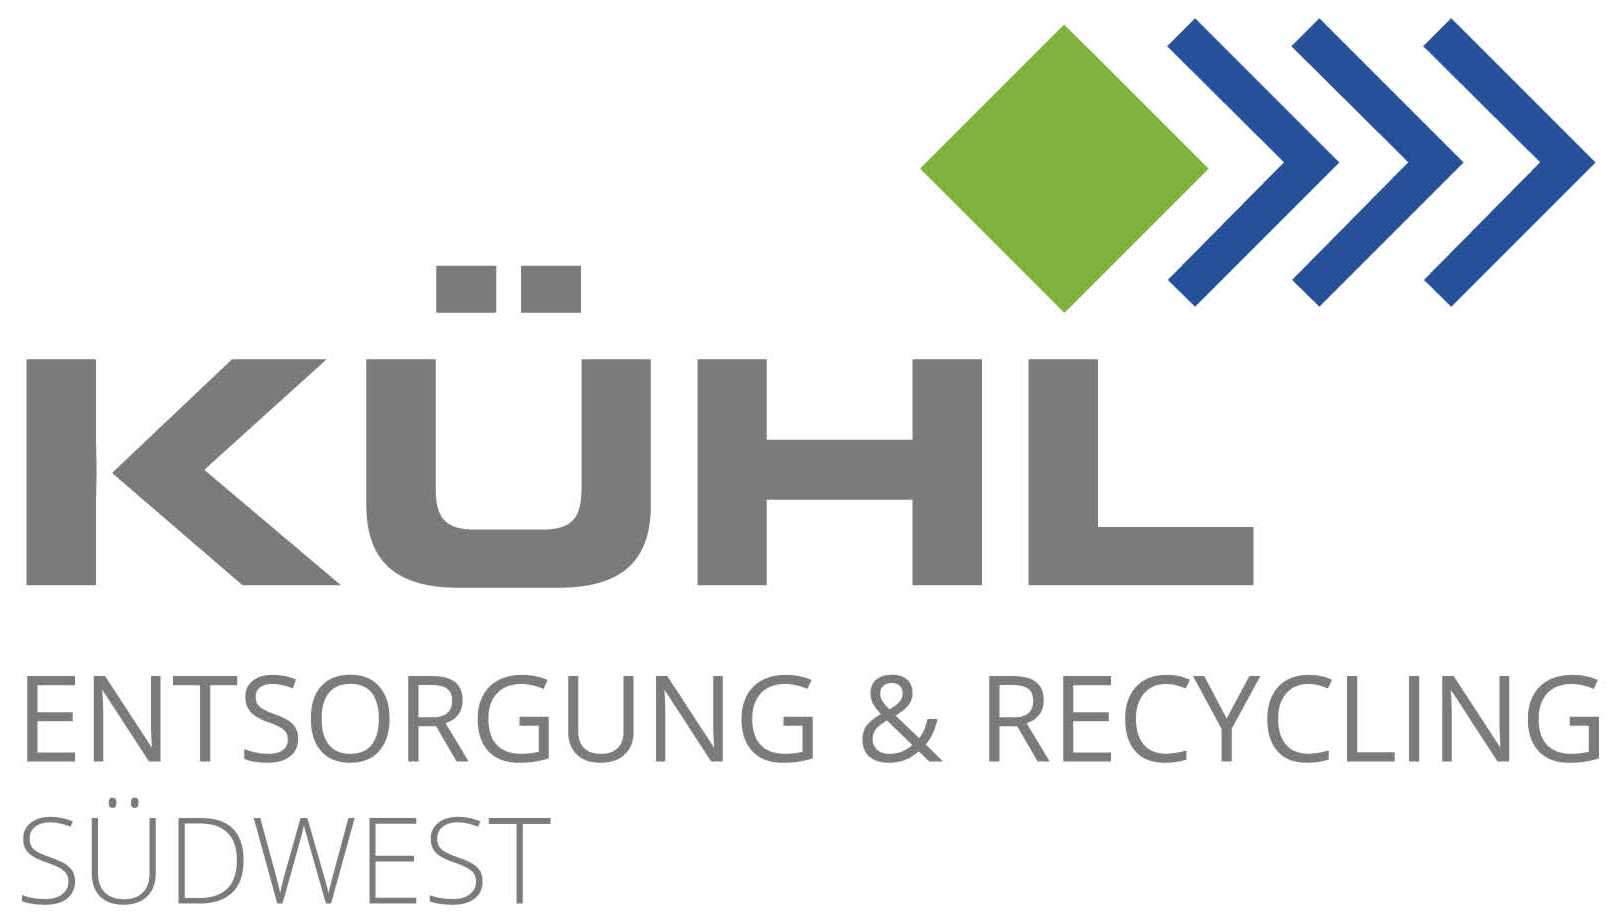 Quelle: Rolf Kühl Holding GmbH & Co. KG, Rolf Kühl Holding GmbH & Co. KG